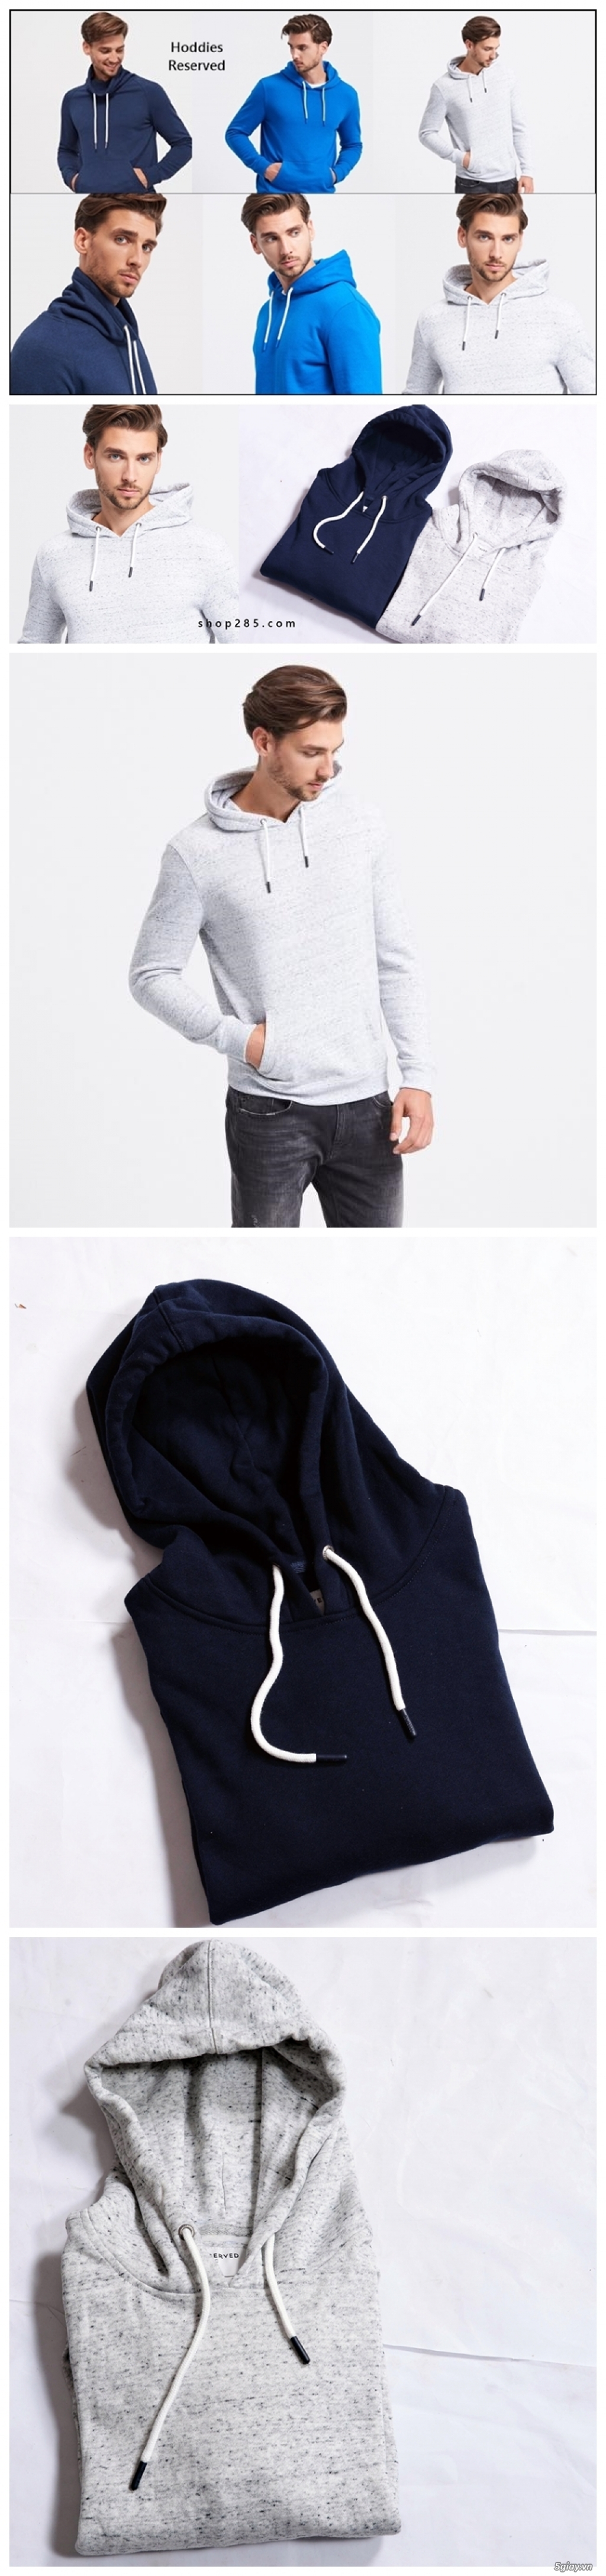 Áo thun Hollister VNXK,áo thun SuperDry VNXK ,áo A&F VNXK ,áo thun cổ tim thun láng - 6